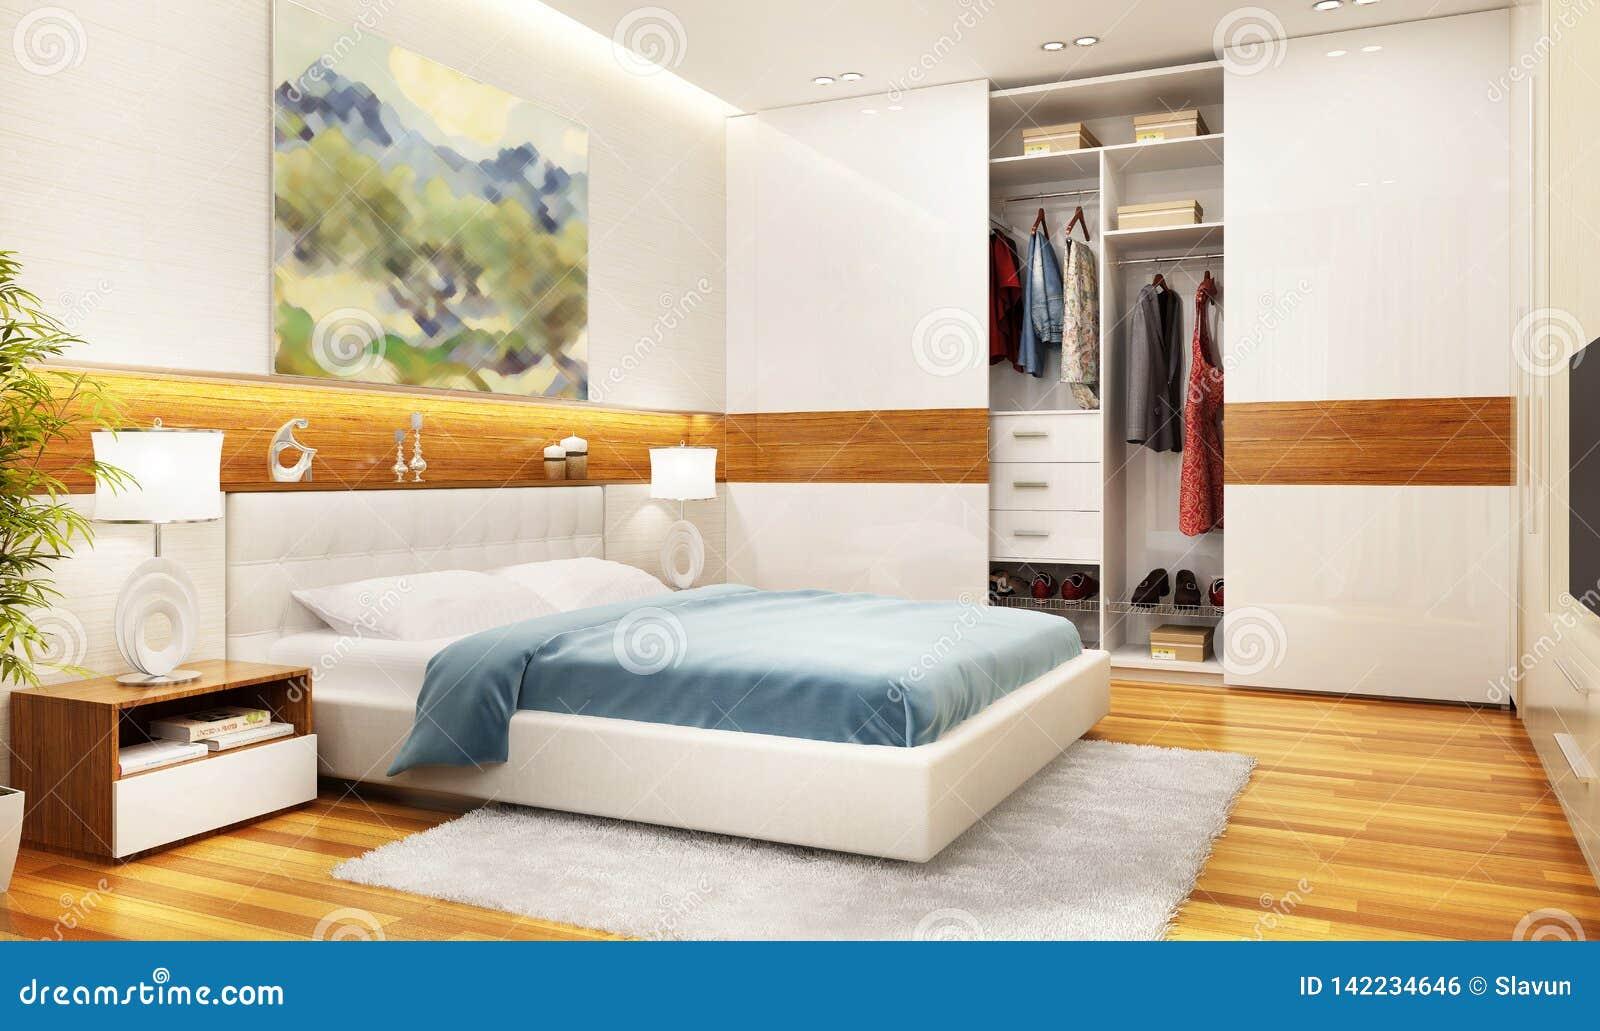 Awesome Modern Bedroom Interior Design With Large Sliding Wardrobe Home Interior And Landscaping Spoatsignezvosmurscom